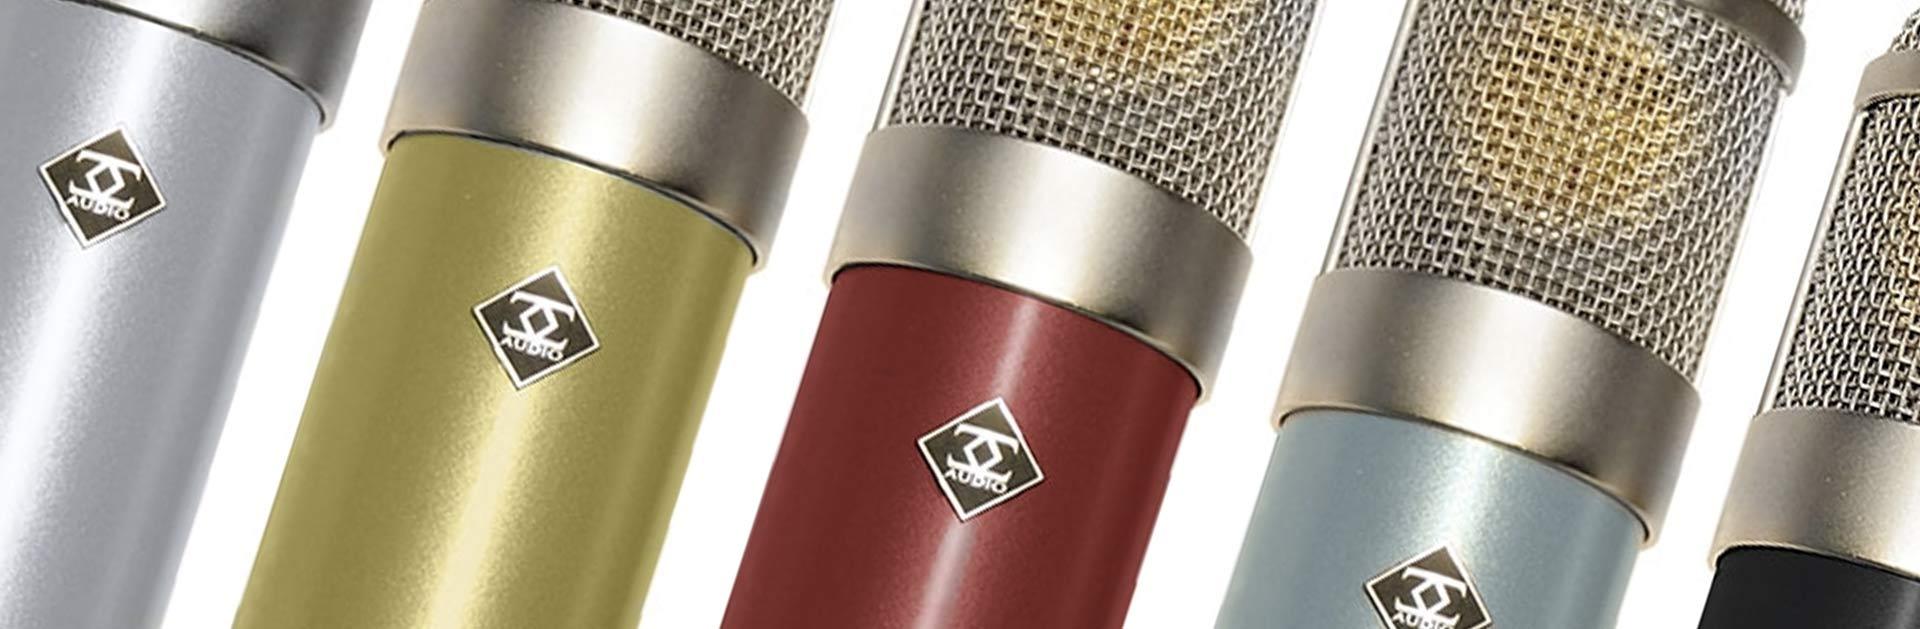 ADK Microphones Dealer Category